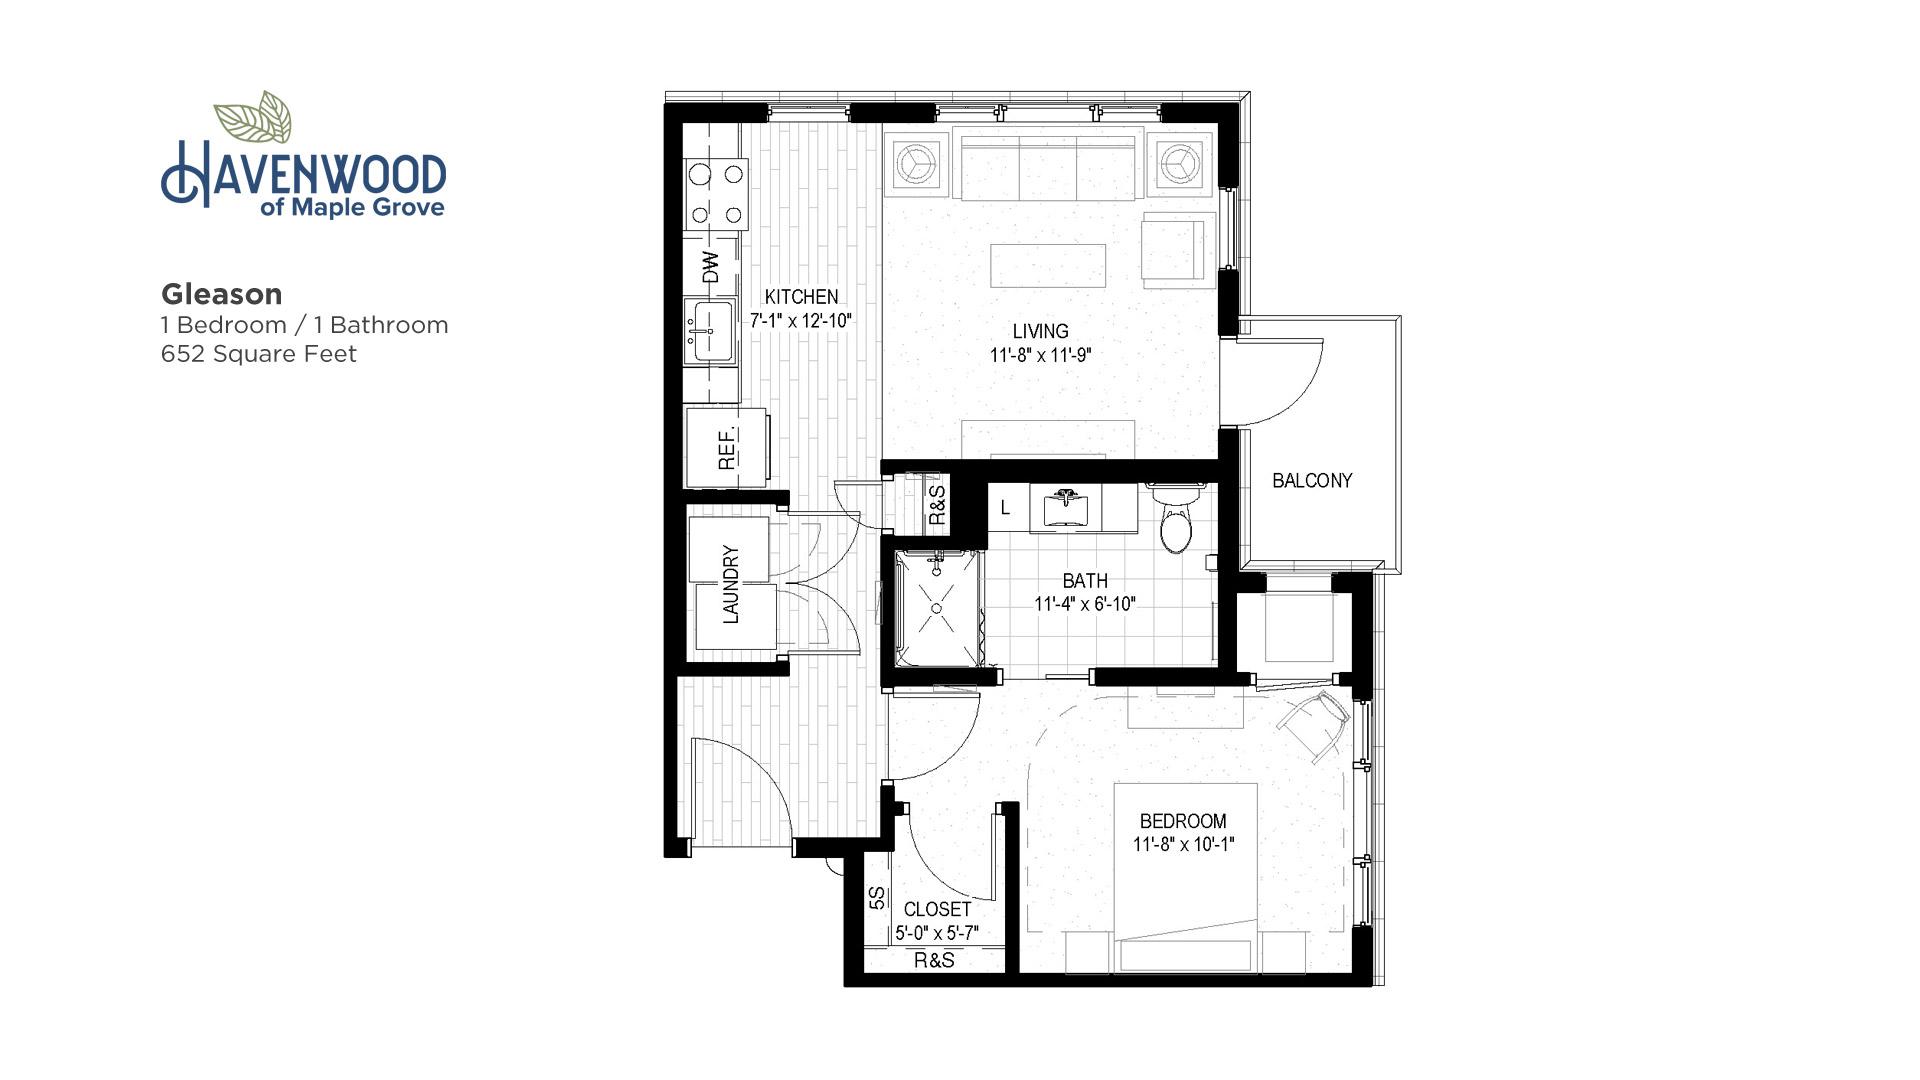 Havenwood of Maple Grove Gleason Floor Plan